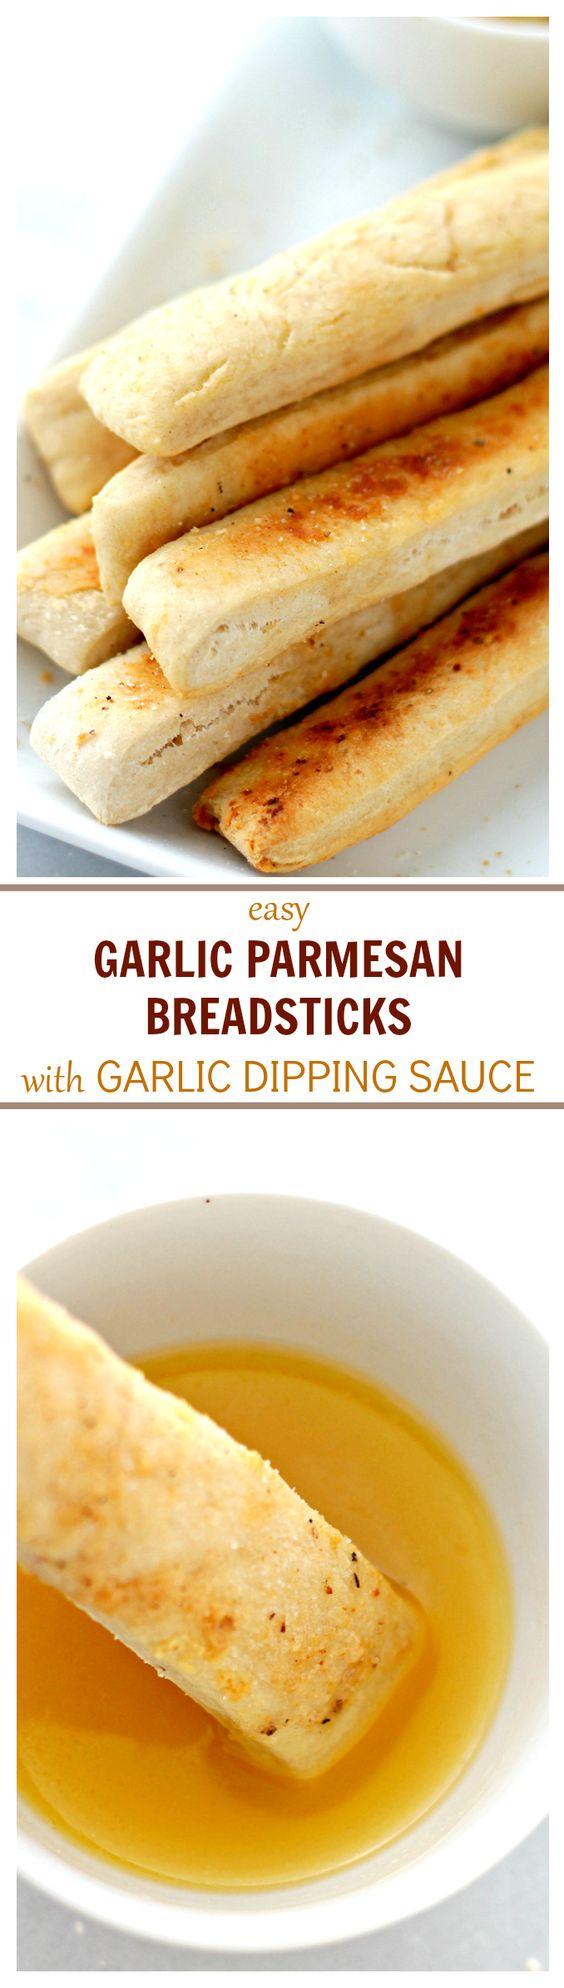 Easy Garlic Parmesan Breadsticks with Garlic Dipping Sauce   www ...